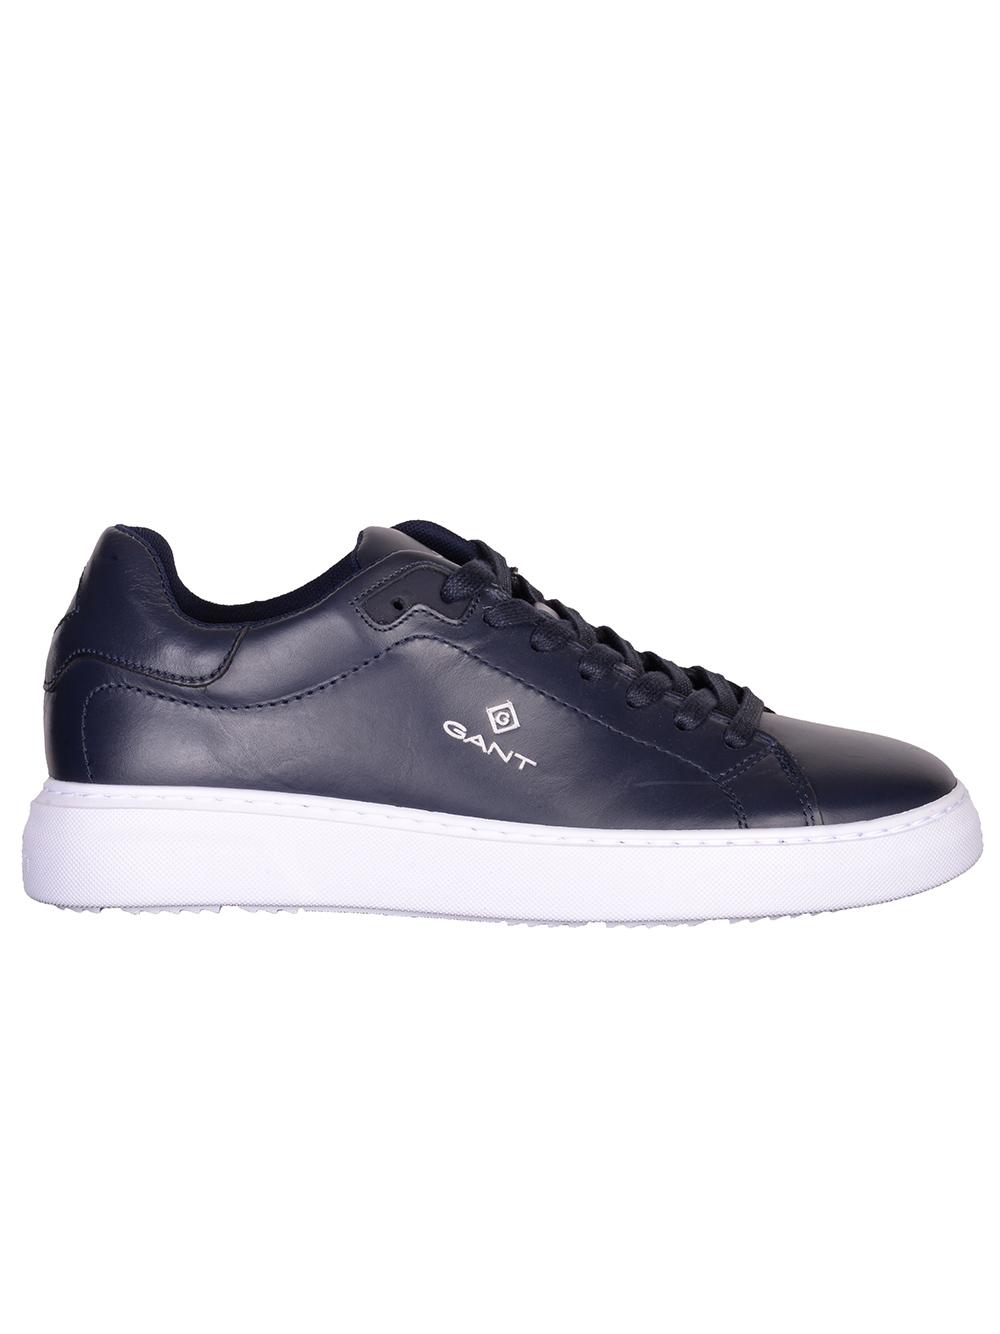 GANT Παπούτσια sneakers 3GS22631645-9 ΜΠΛΕ